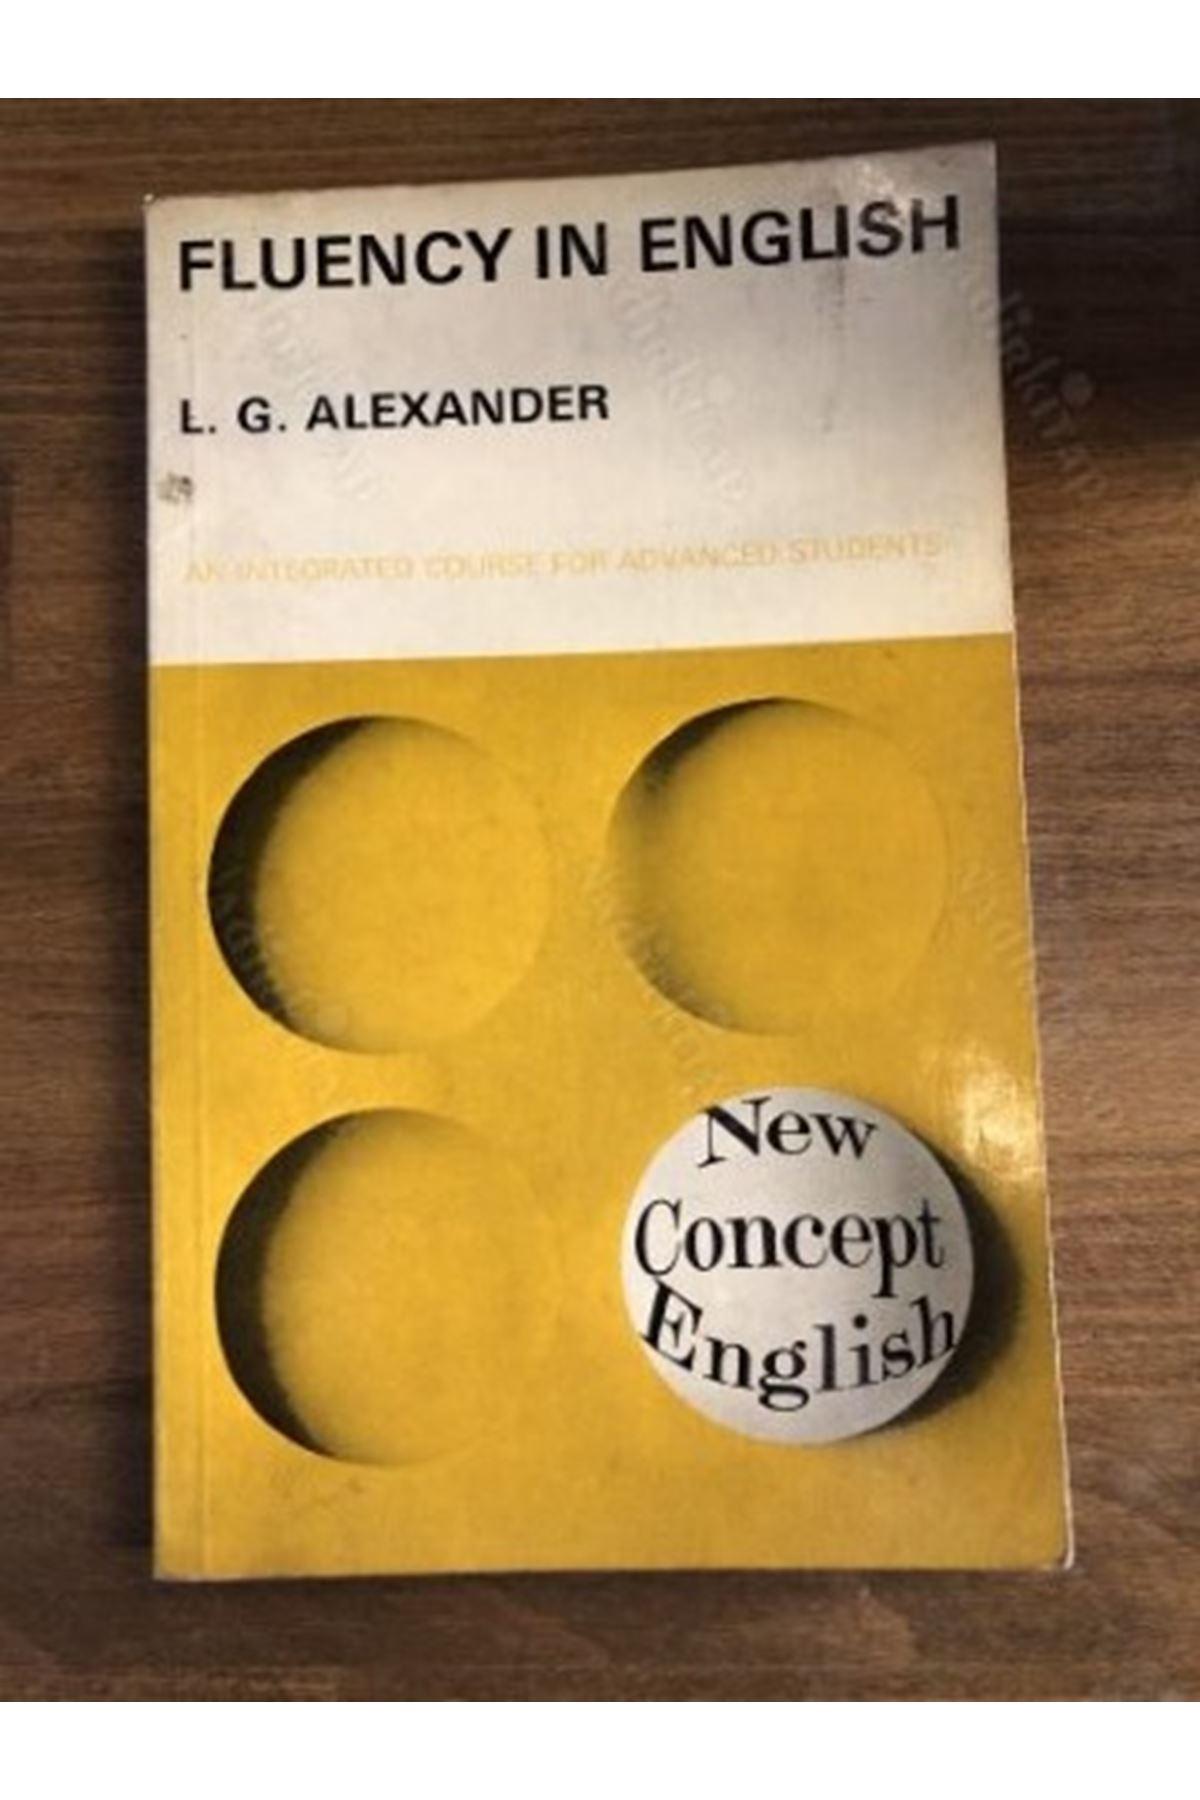 L.G.ALEXANDER - FLUENCY IN ENGLISH